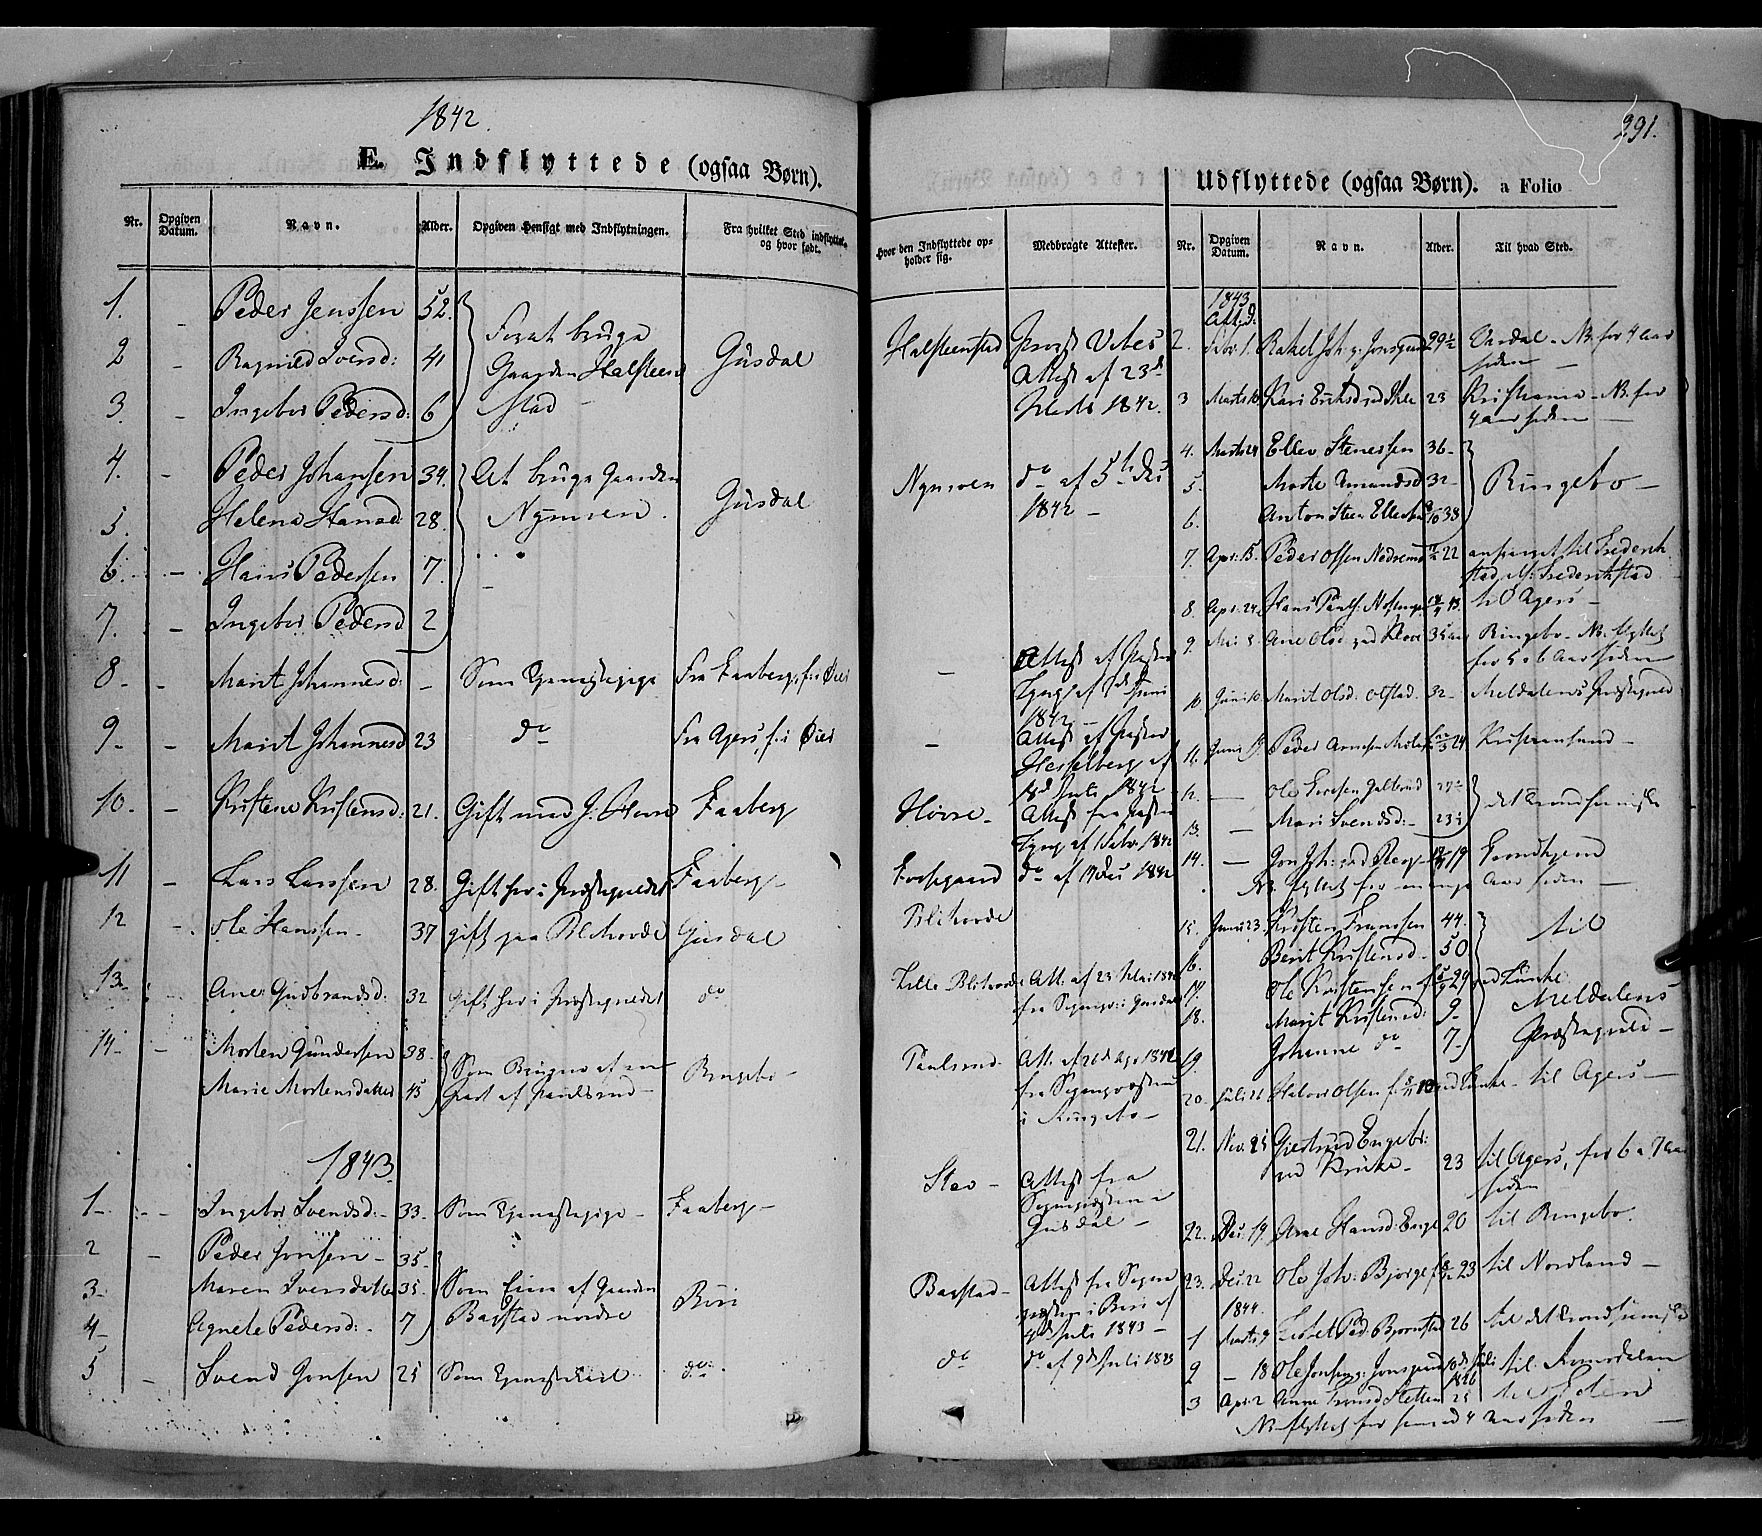 SAH, Øyer prestekontor, Ministerialbok nr. 5, 1842-1857, s. 291